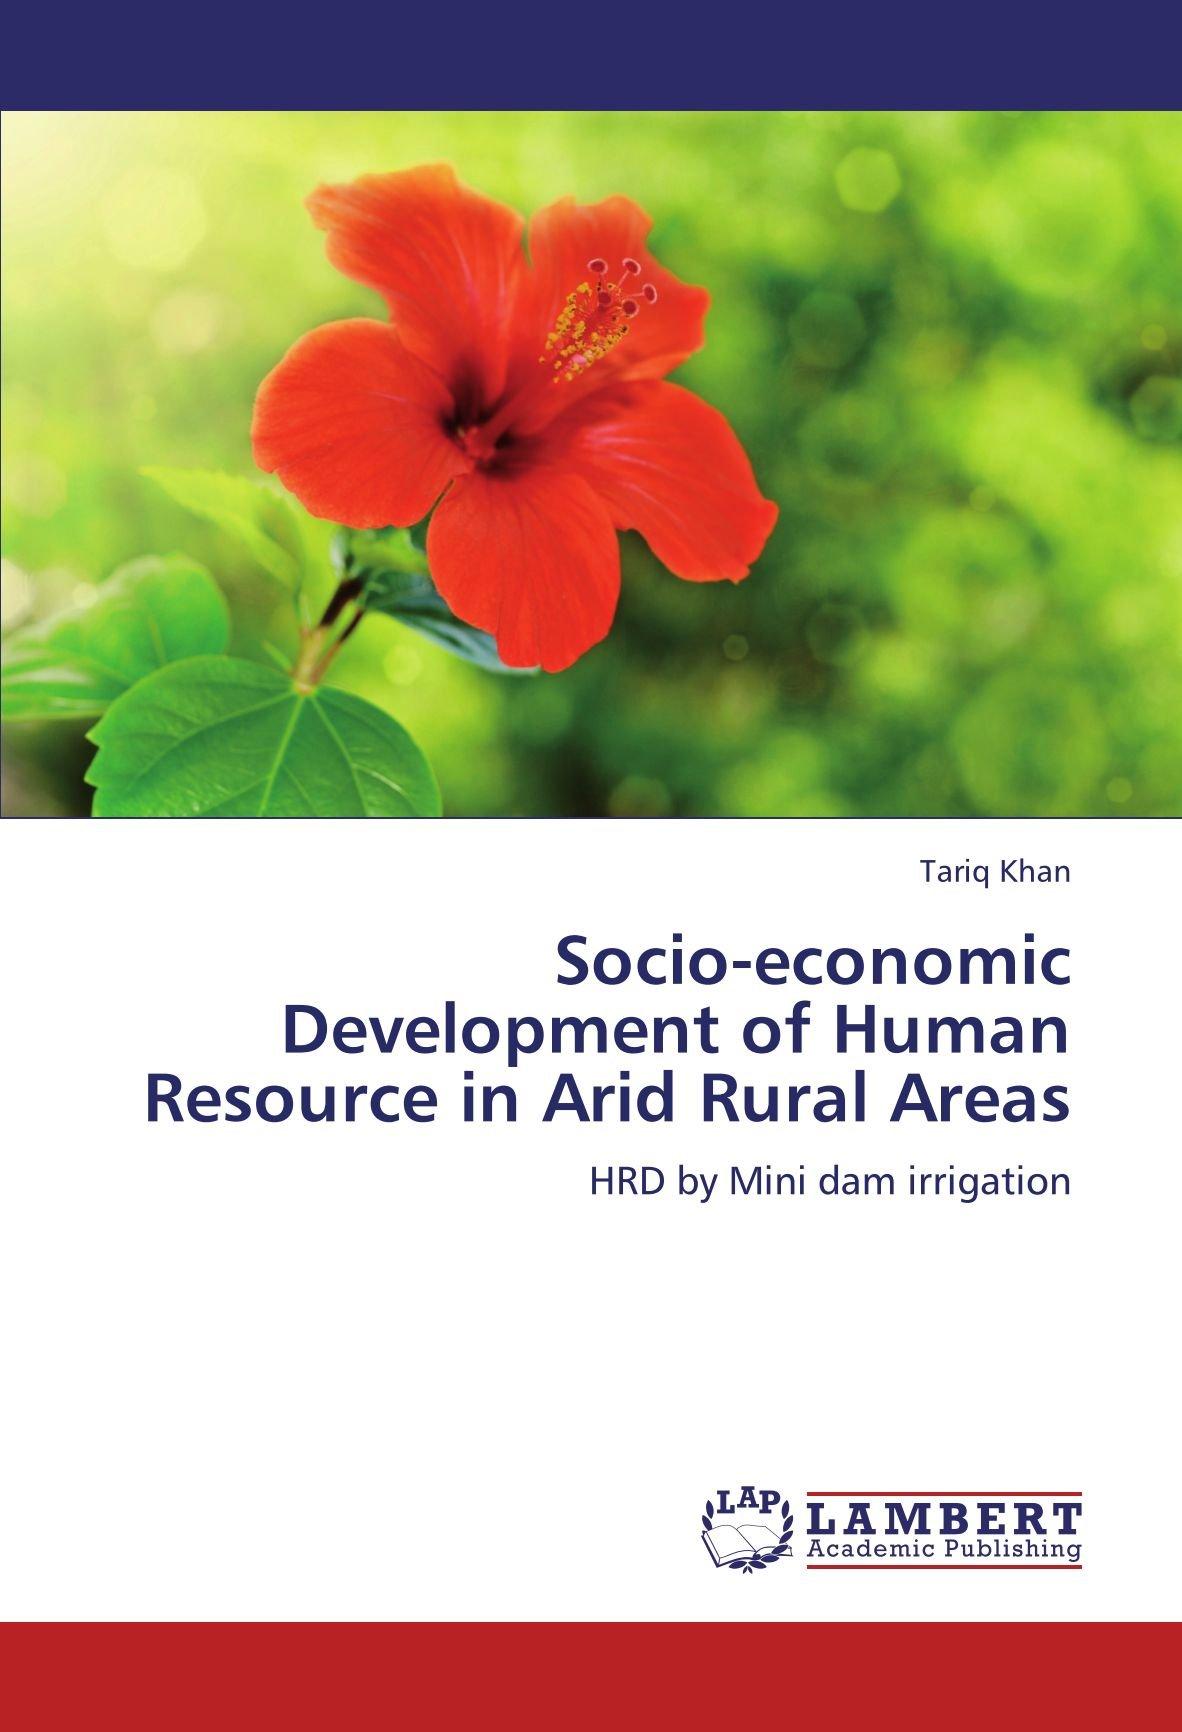 Socio-economic Development of Human Resource in Arid Rural Areas: HRD by Mini dam irrigation